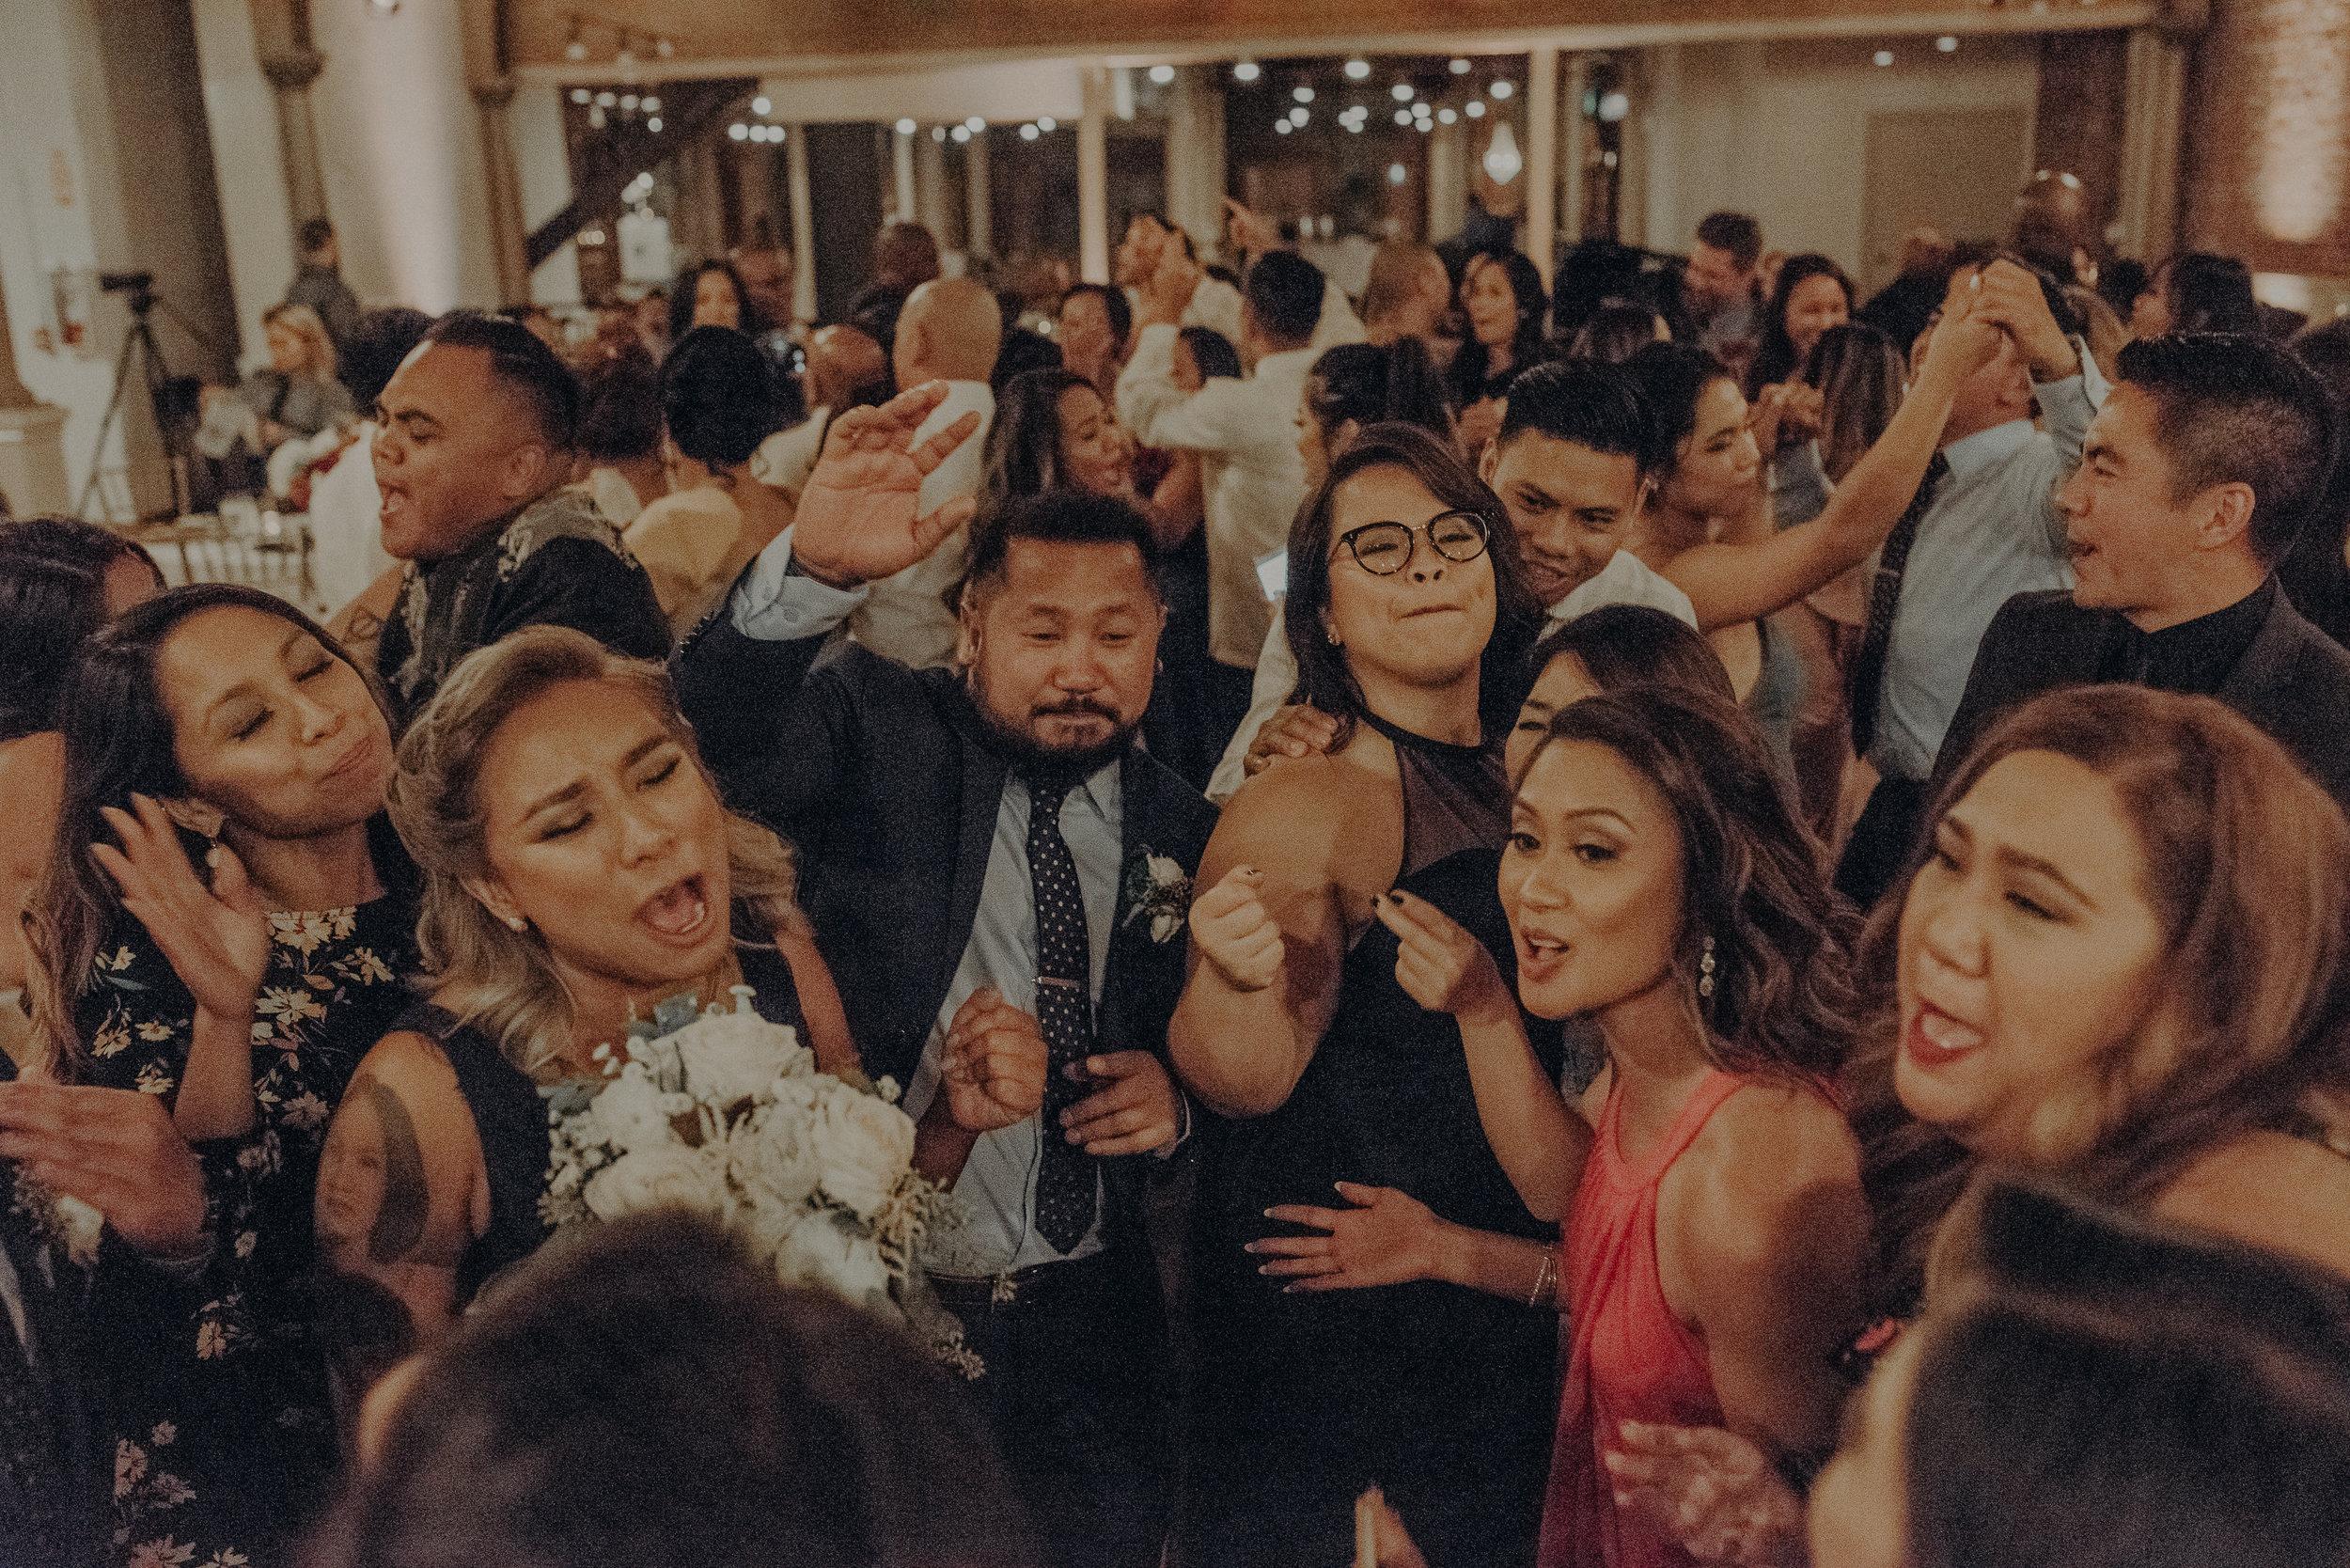 ©Isaiah + Taylor Photography - the Loft on Pine Wedding, Long Beach Wedding Photographer-070.jpg